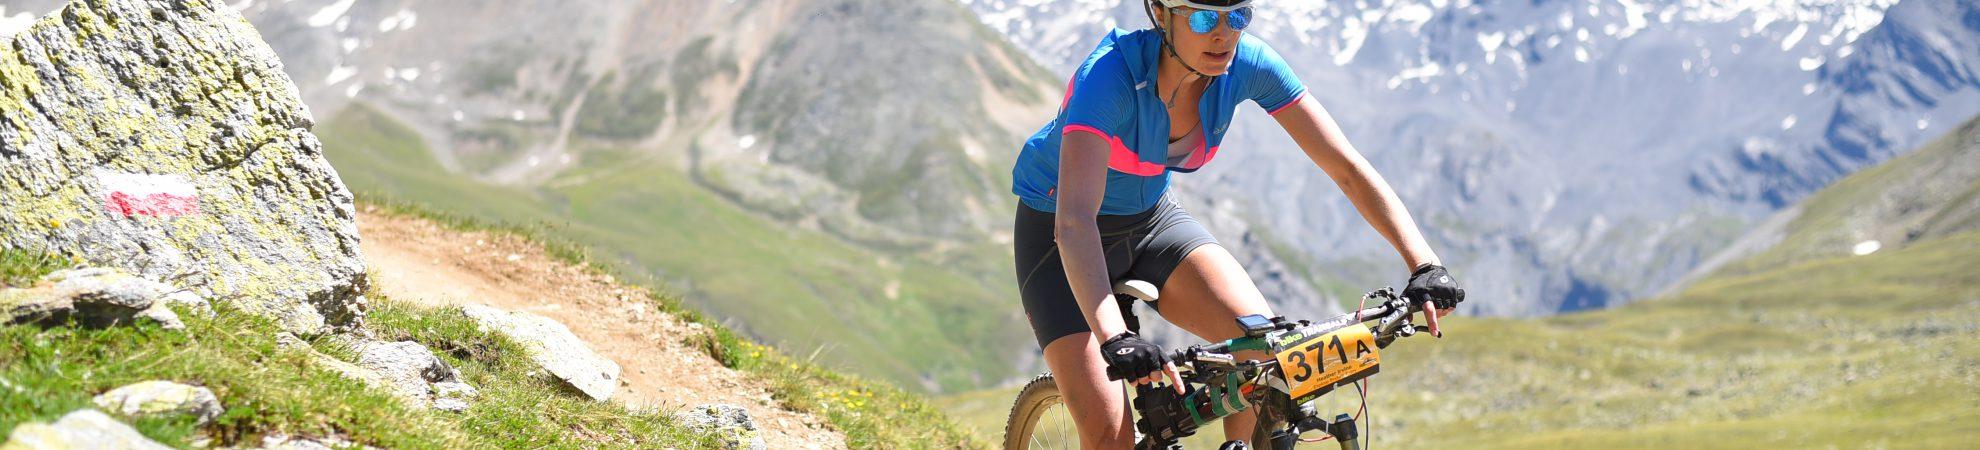 TransAlp Mtb Race Tips